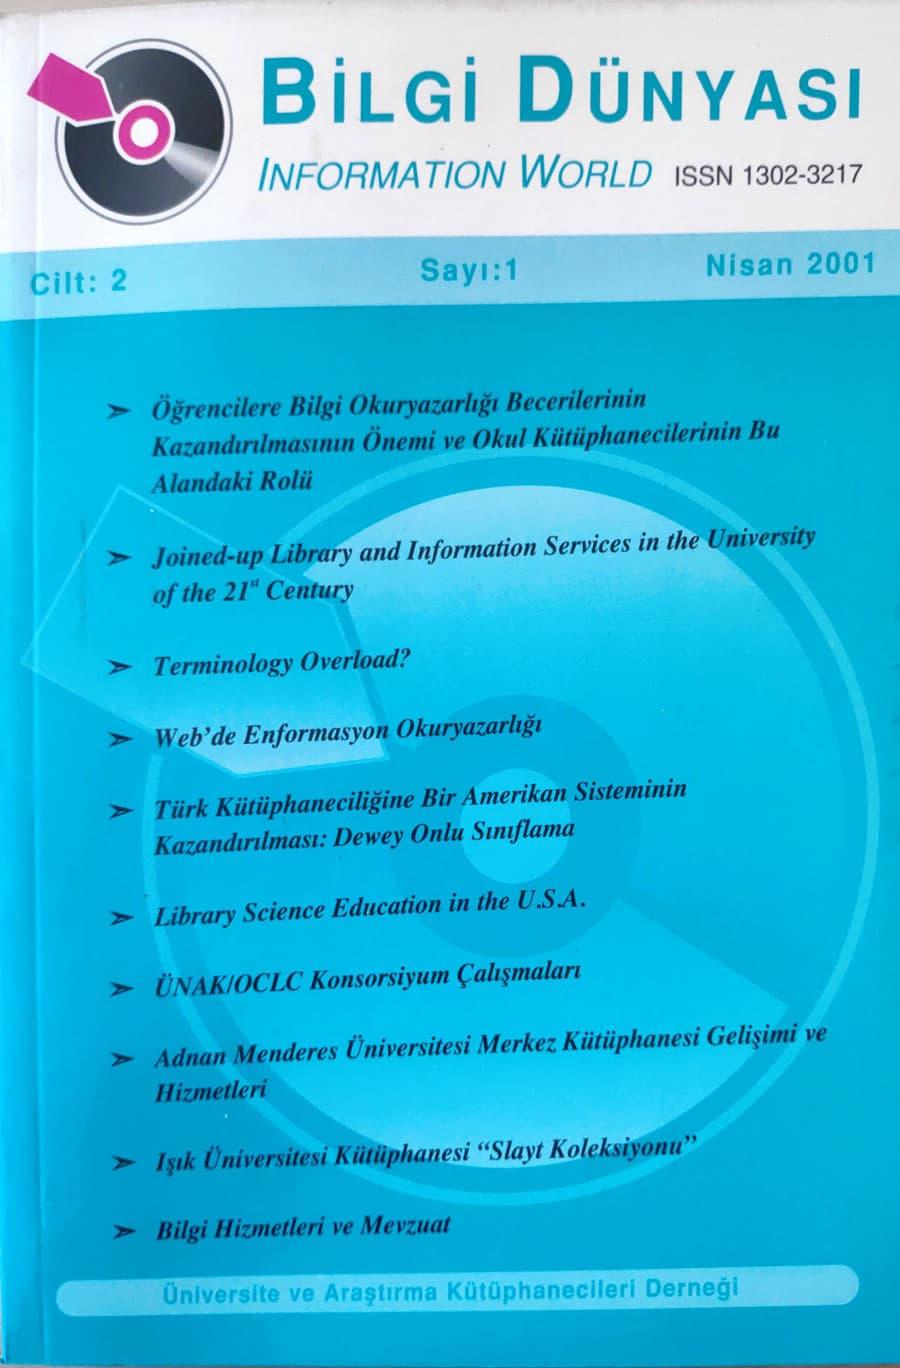 Vol. 2 No. 1 (2001)